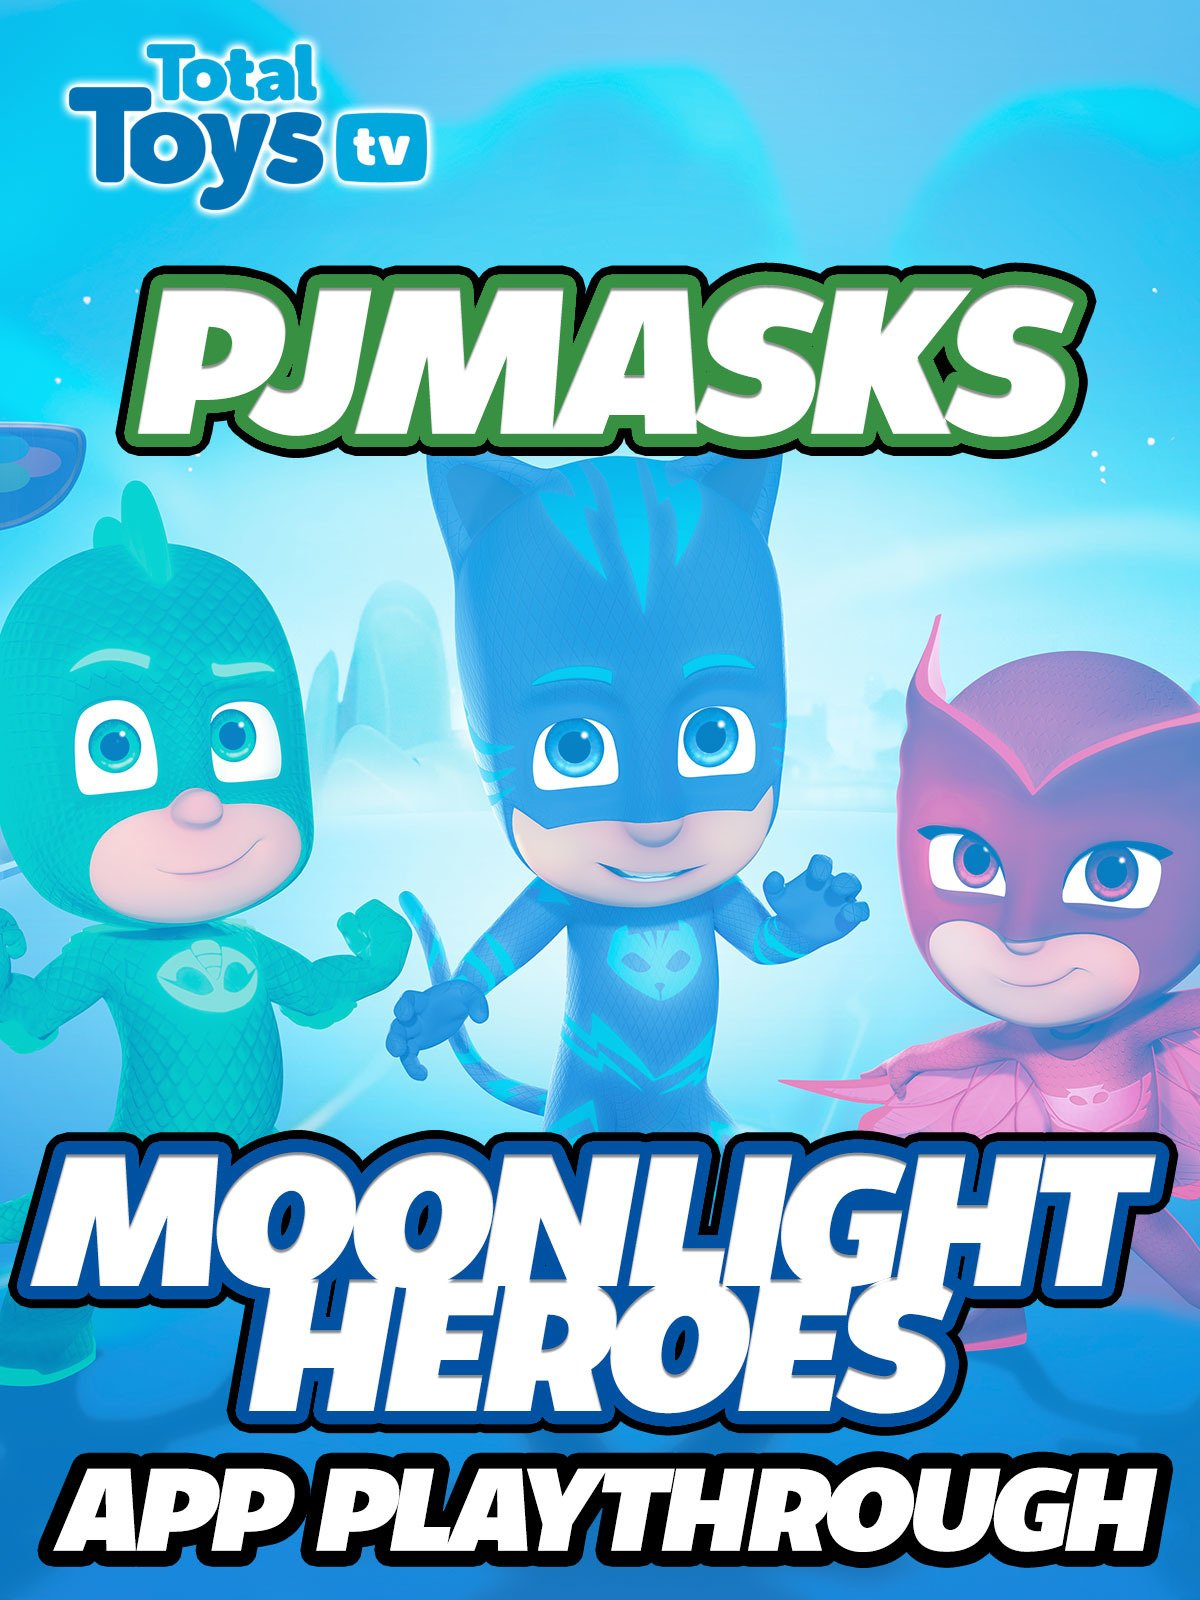 Amazon.com: Clip: PJ Masks Moonlight Heroes App Playthrough: Jason Forthofer